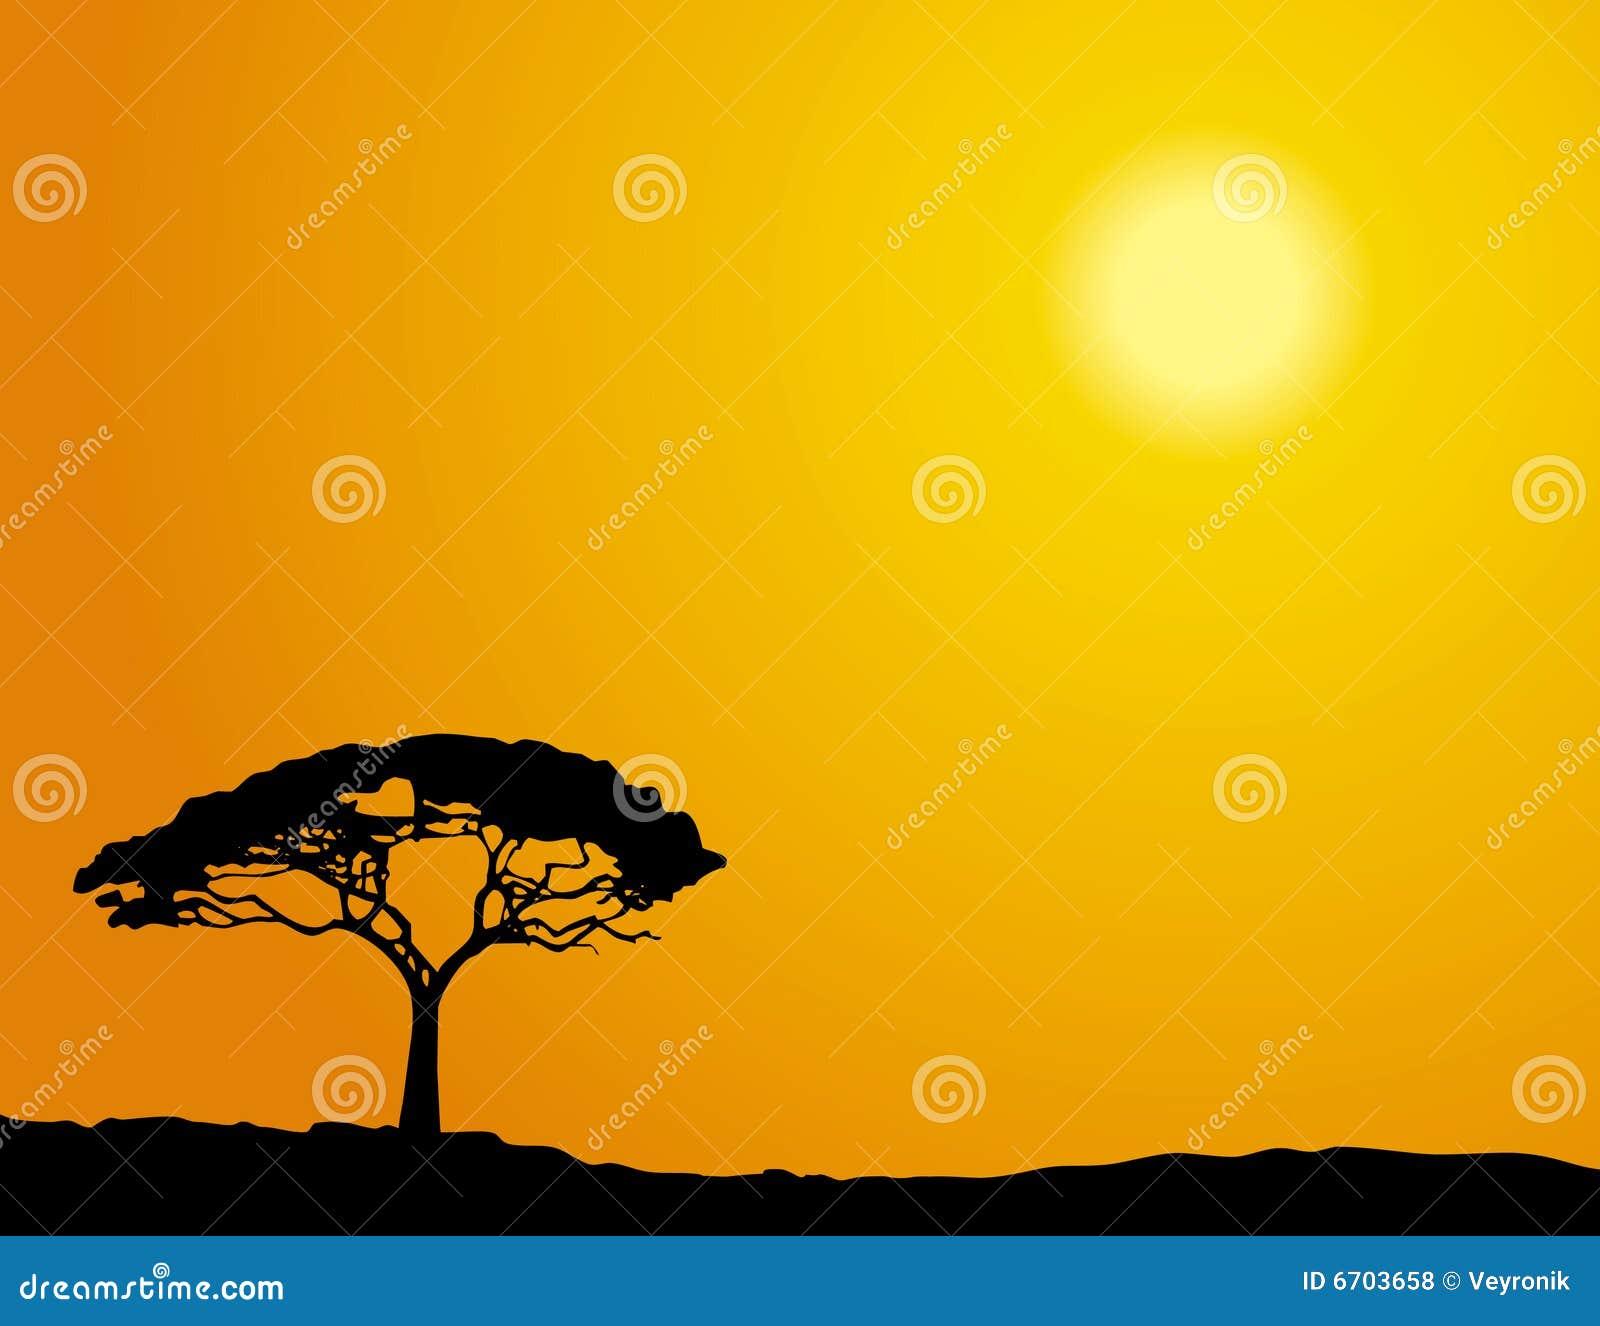 afrikanischer baum lizenzfreie stockfotos bild 6703658. Black Bedroom Furniture Sets. Home Design Ideas